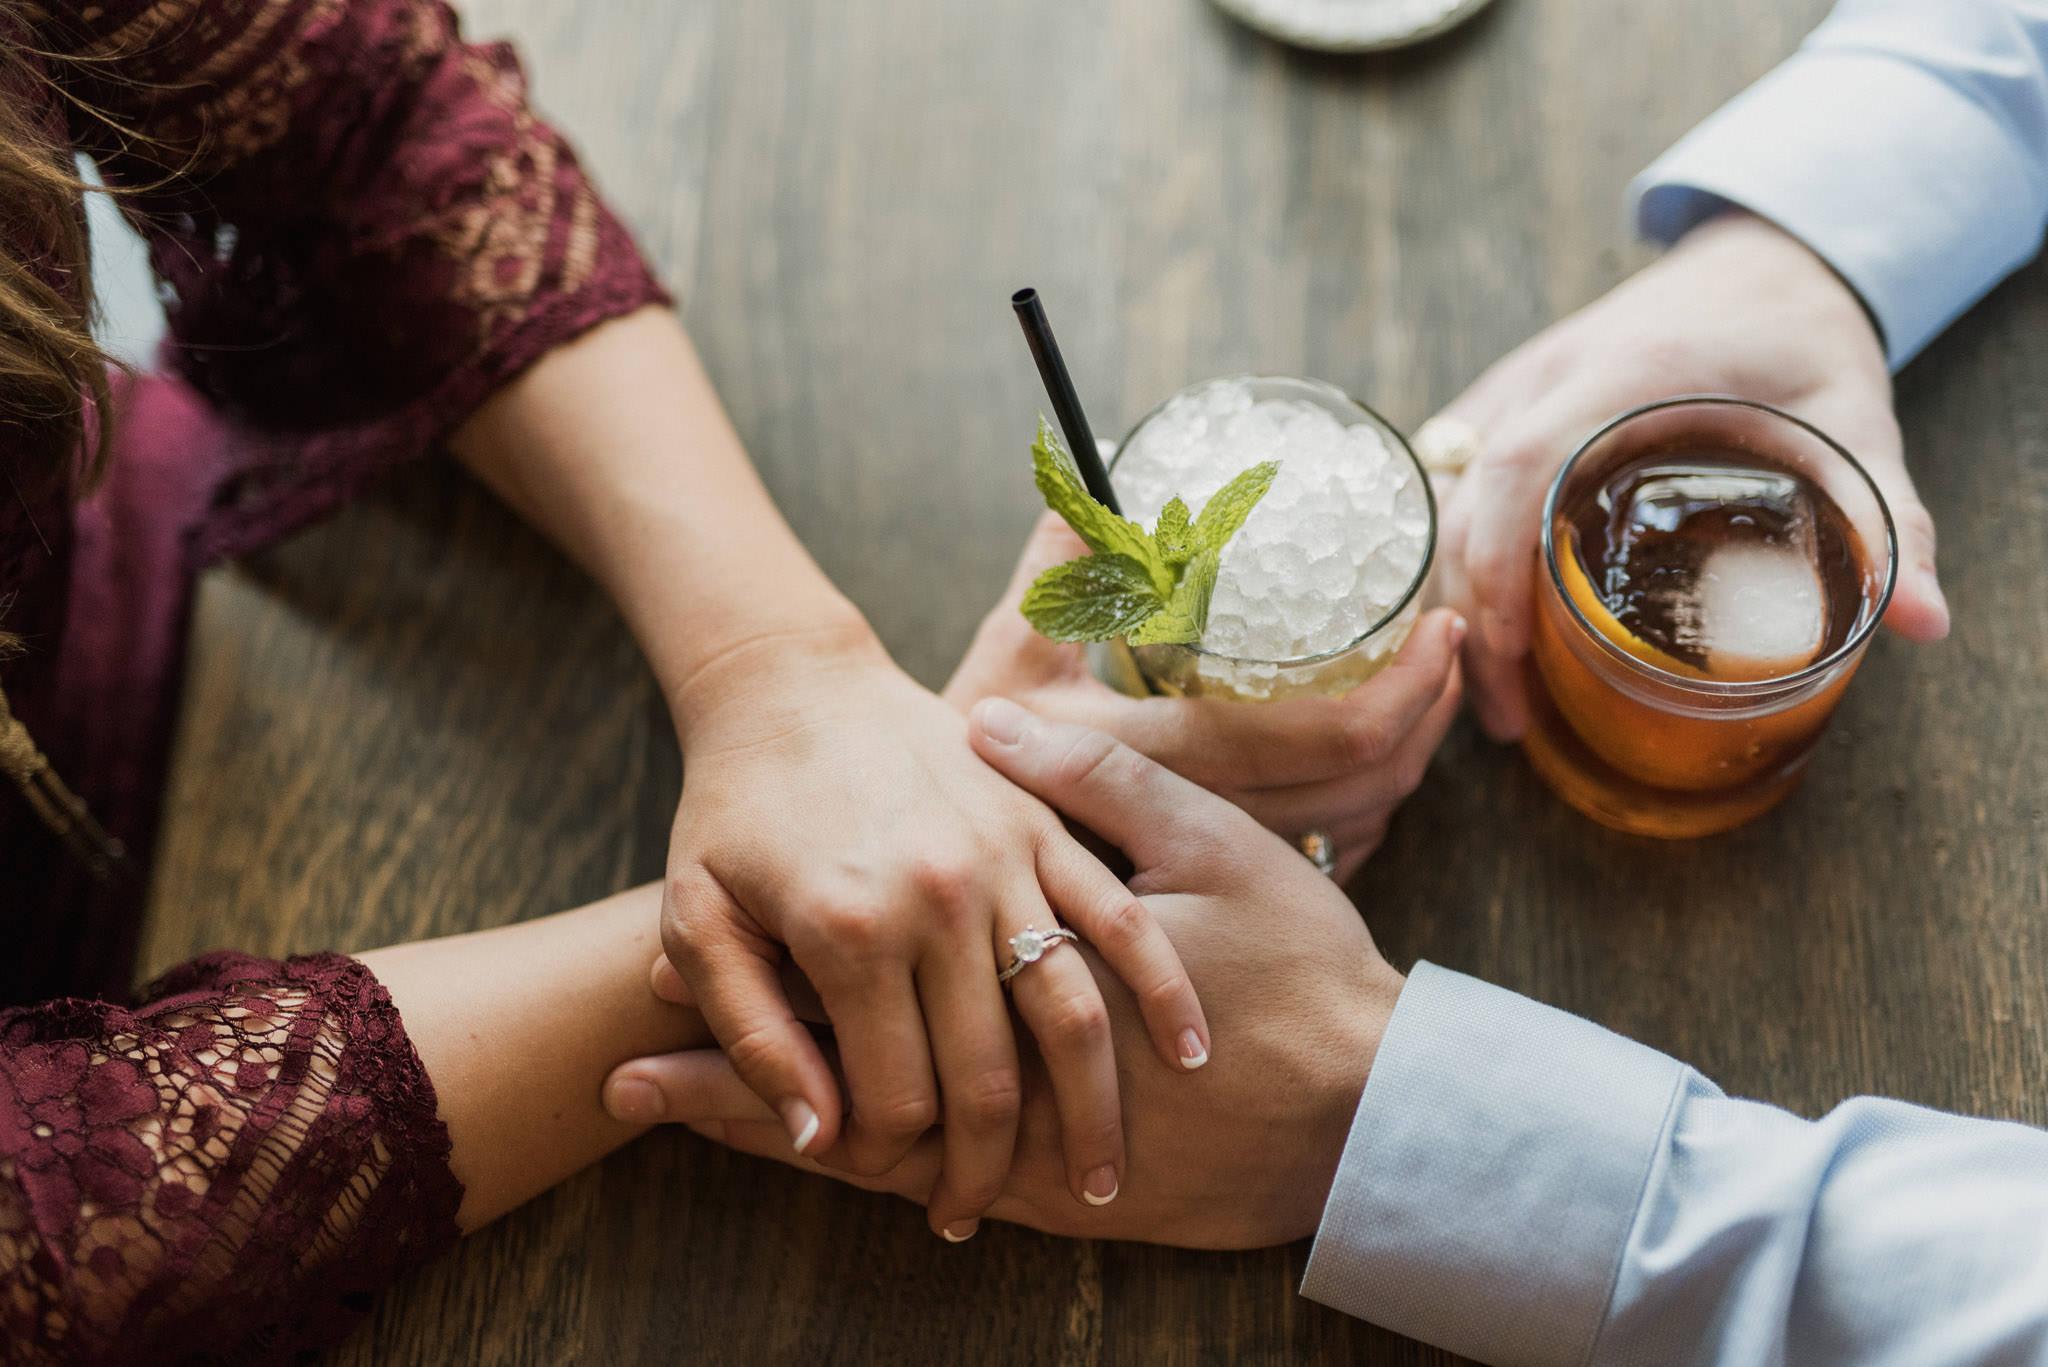 katie-joe-hughes-manor-engagement-julep-bar-cocktail-sm-31.jpg